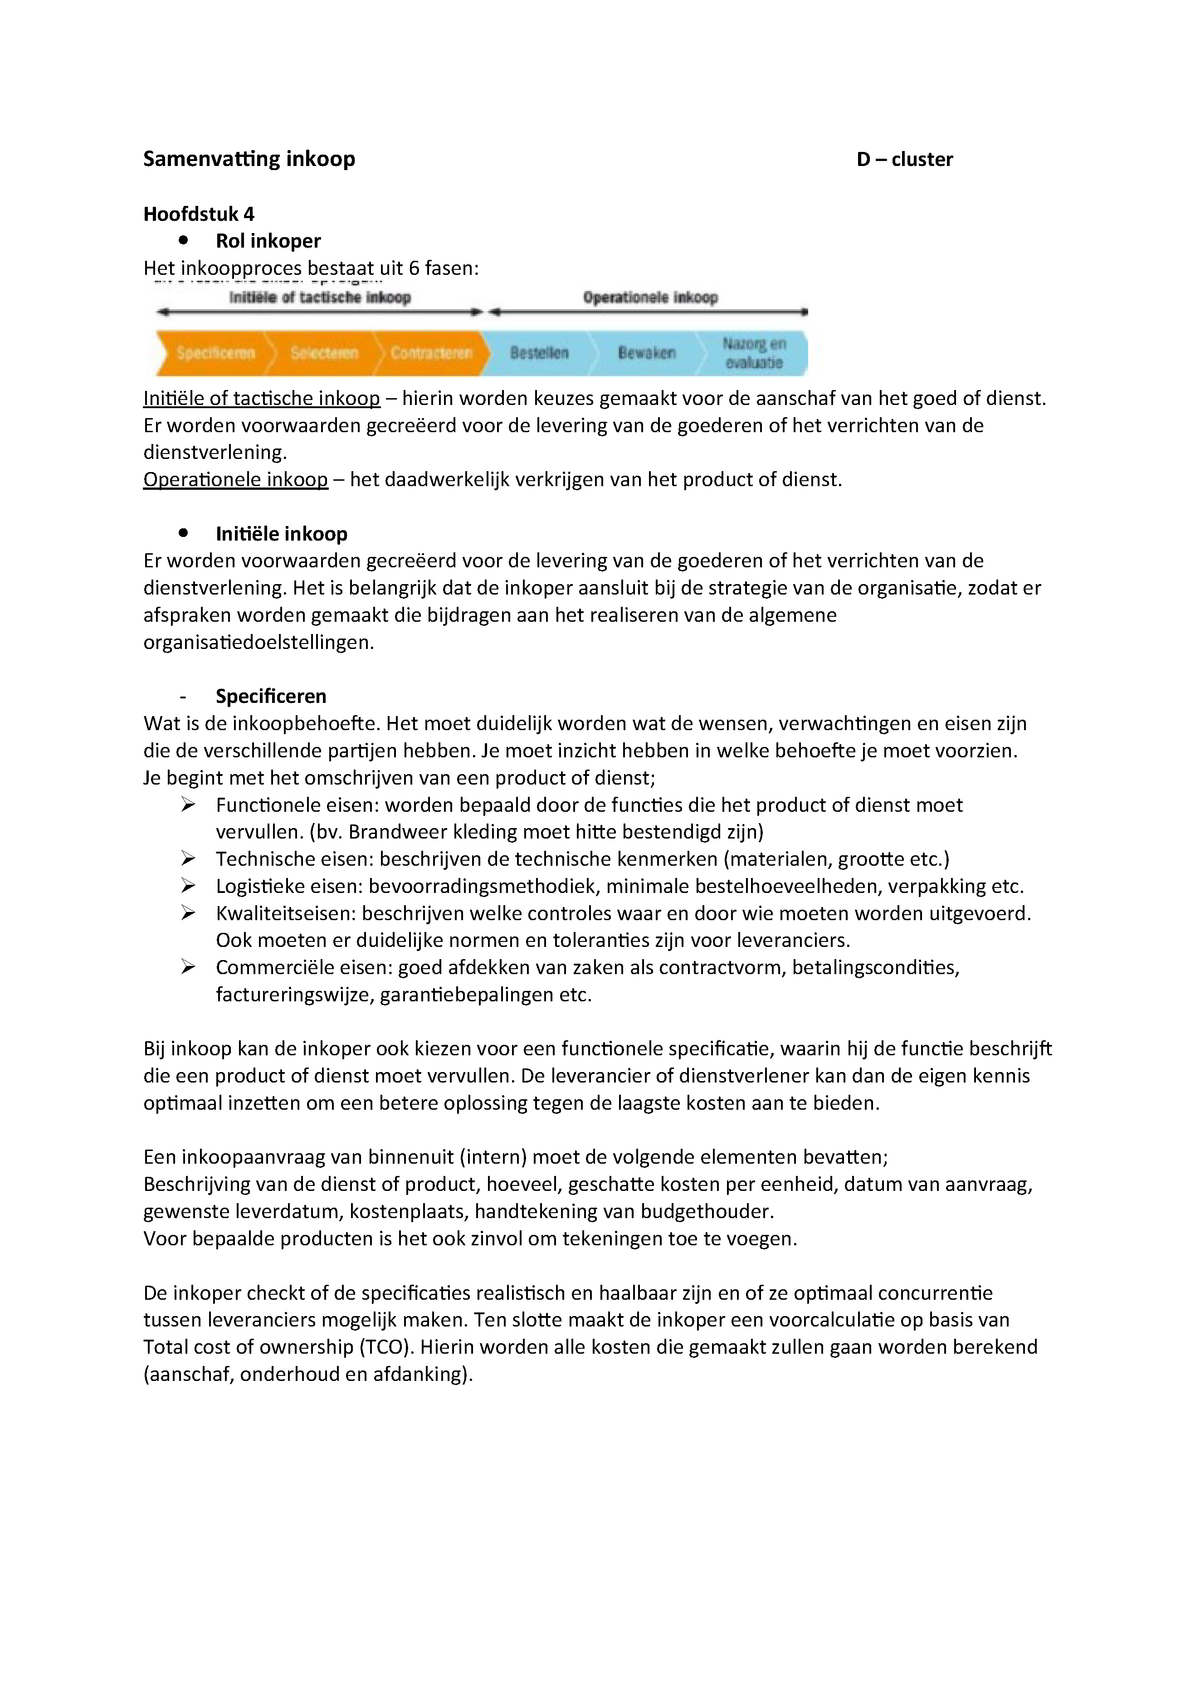 Samenvatting Inkoop D cluster CSA INV1A HAN StudeerSnel